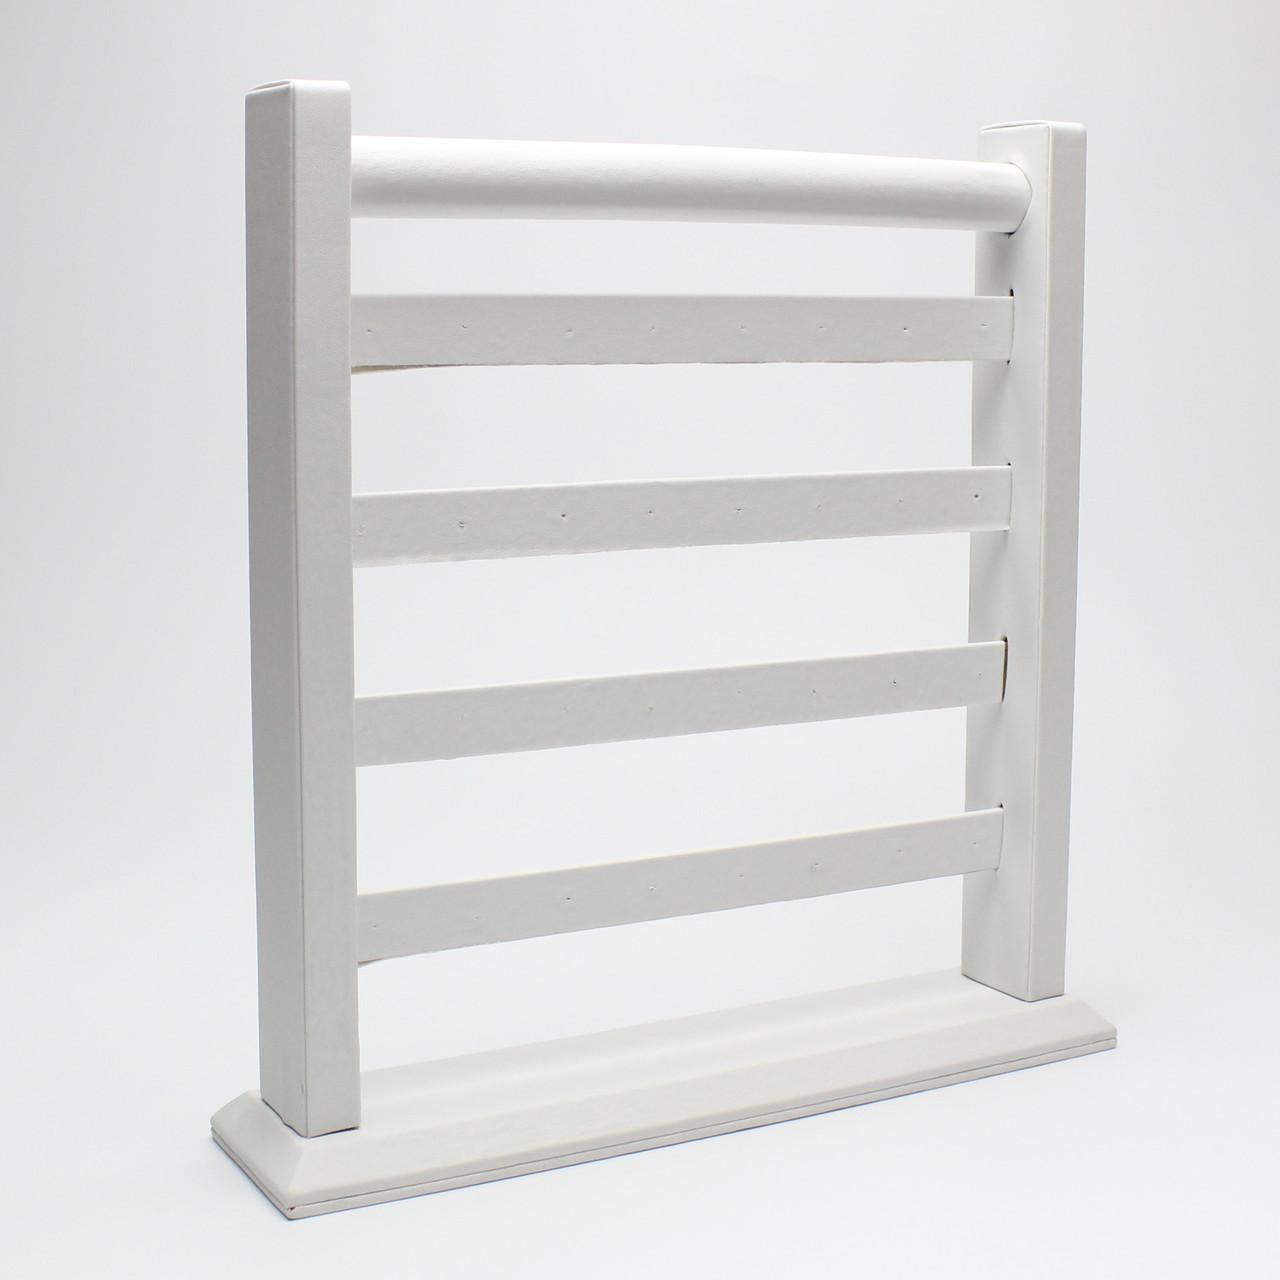 Подставка для серег белая экокожа